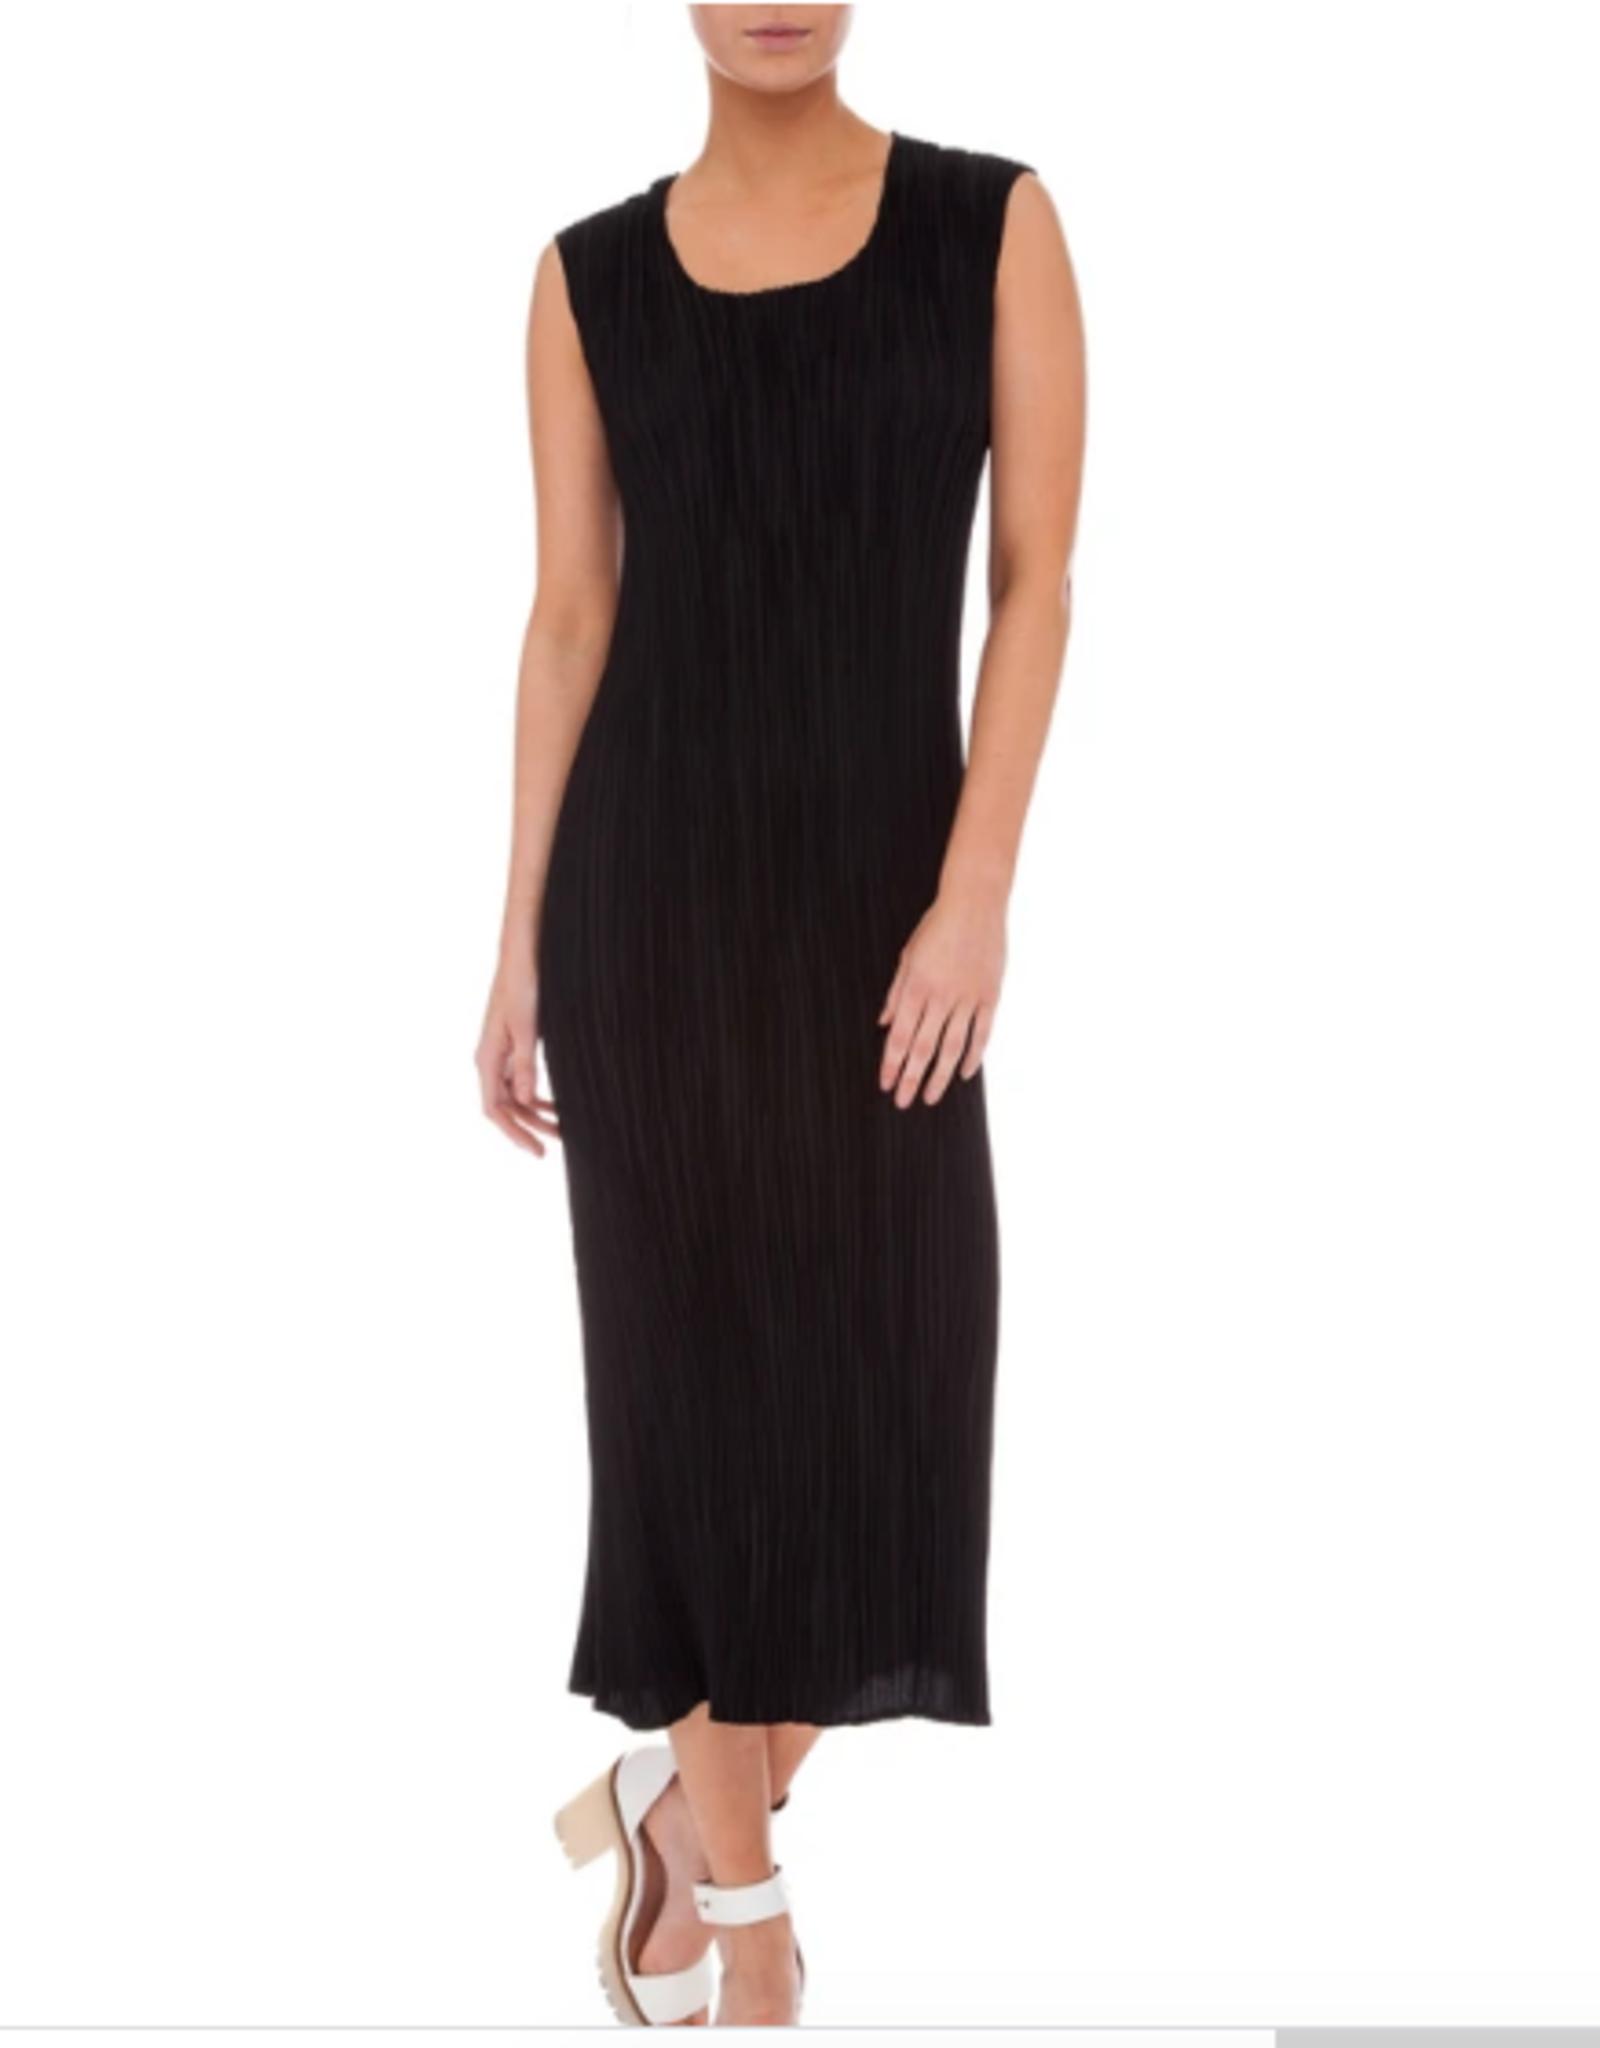 ALQUEMA - Lara Dress